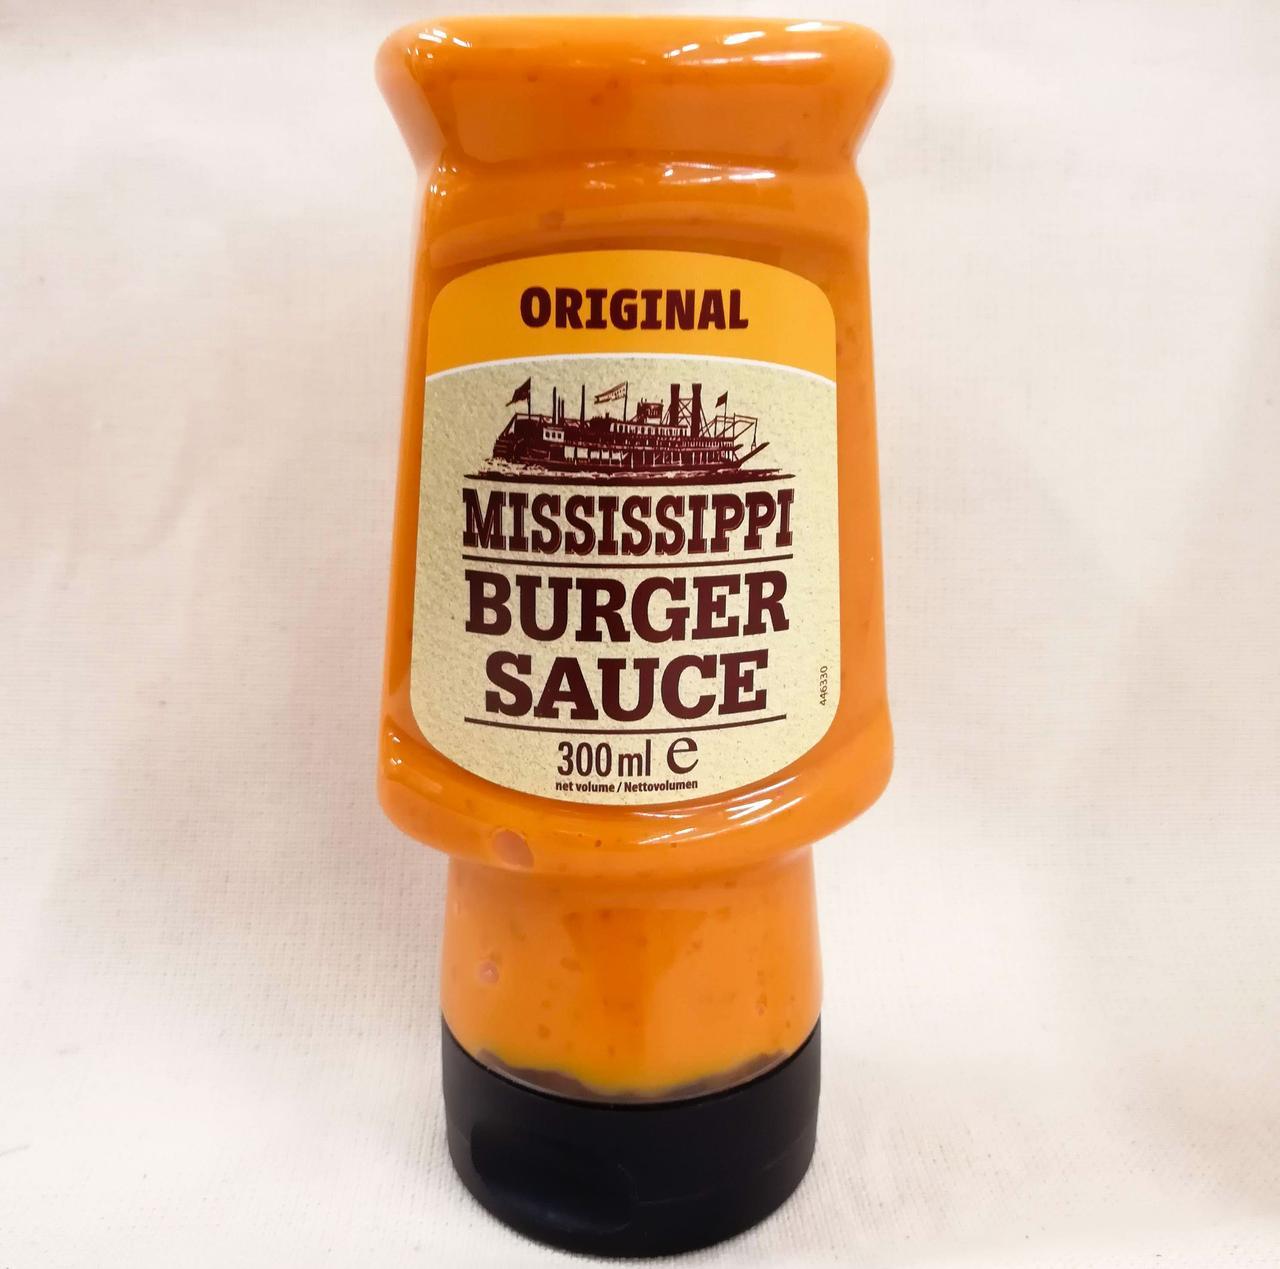 Mississippi Burger Sauce Original